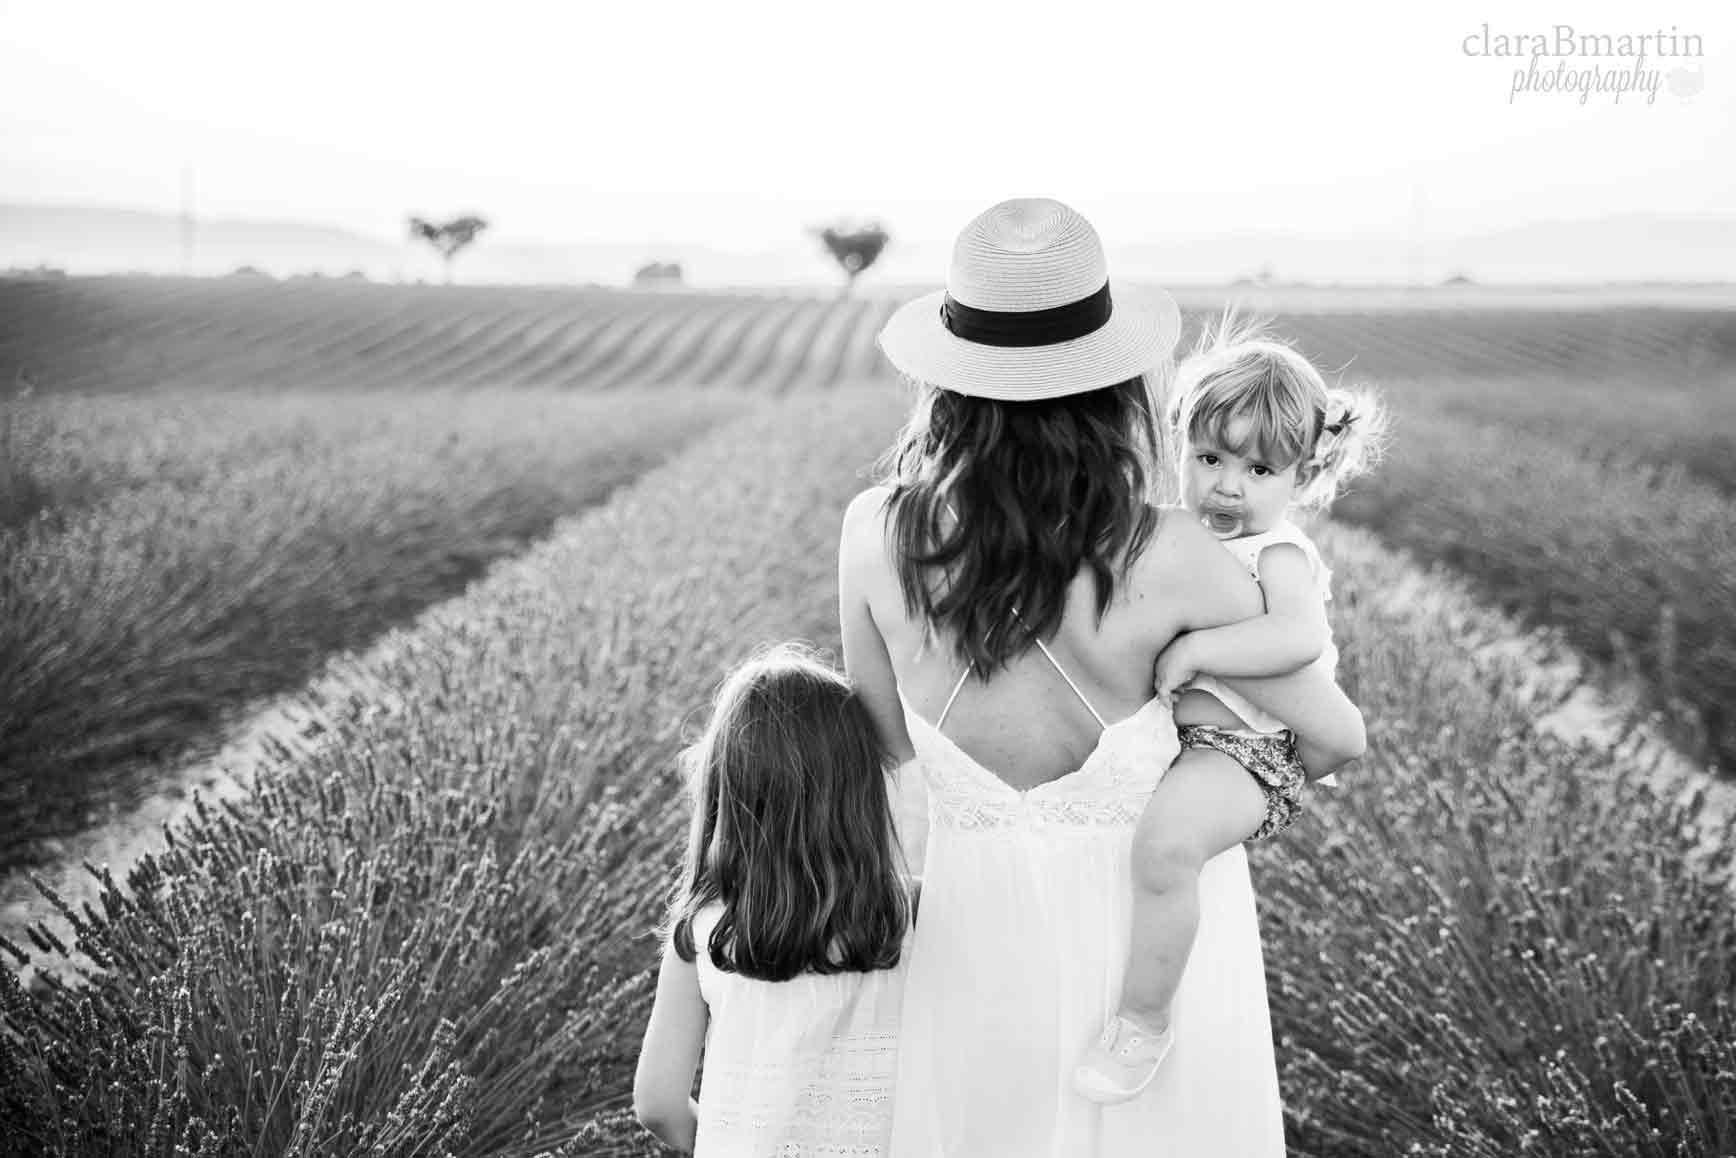 Lavender-fields-Provence-claraBmartin15